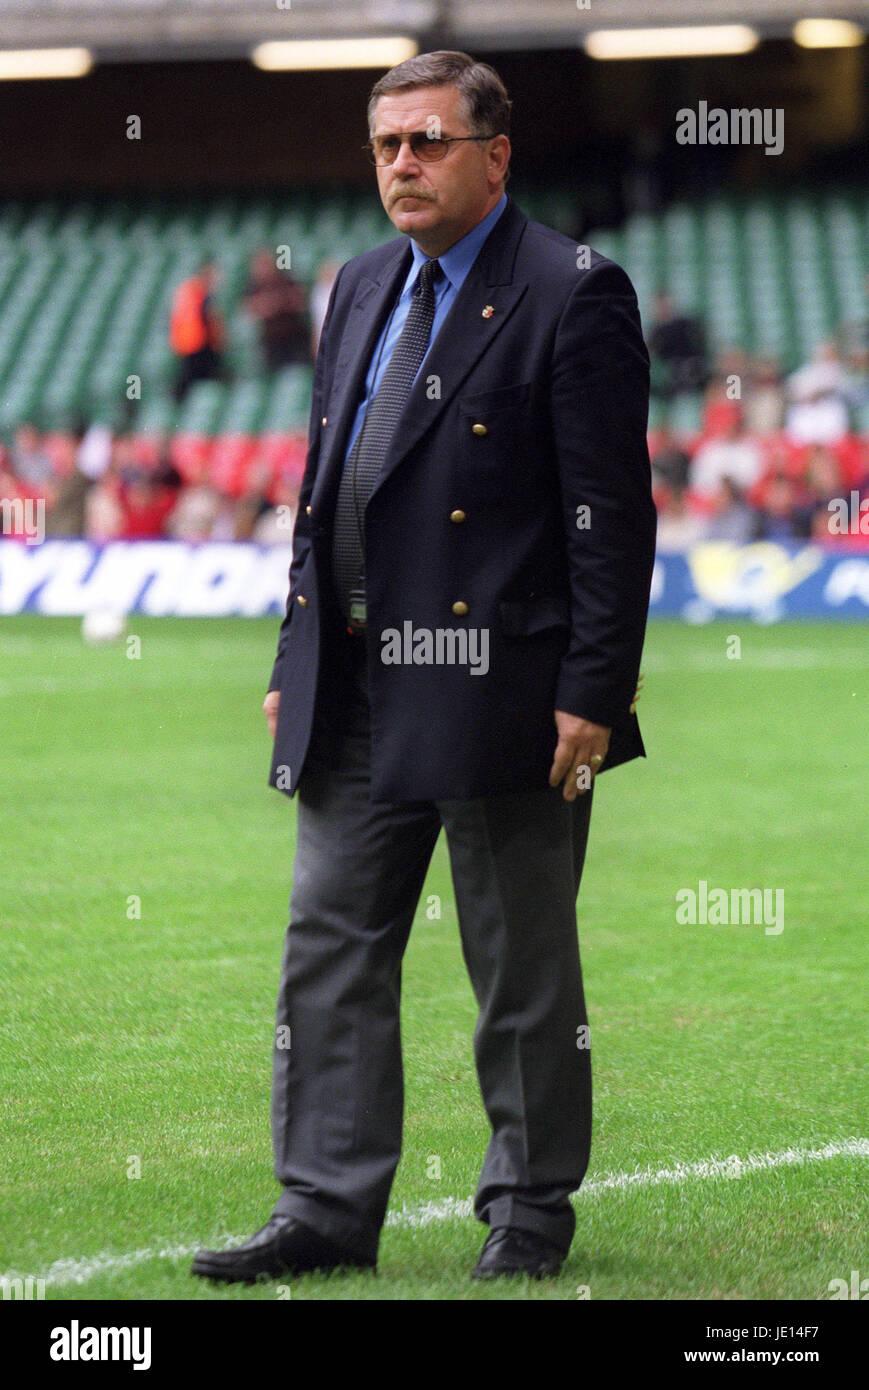 JERZY ENGEL Polen FUßBALLTRAINER CARDIFF Millenium Stadion CARDIFF 2. Juni 2001 Stockbild